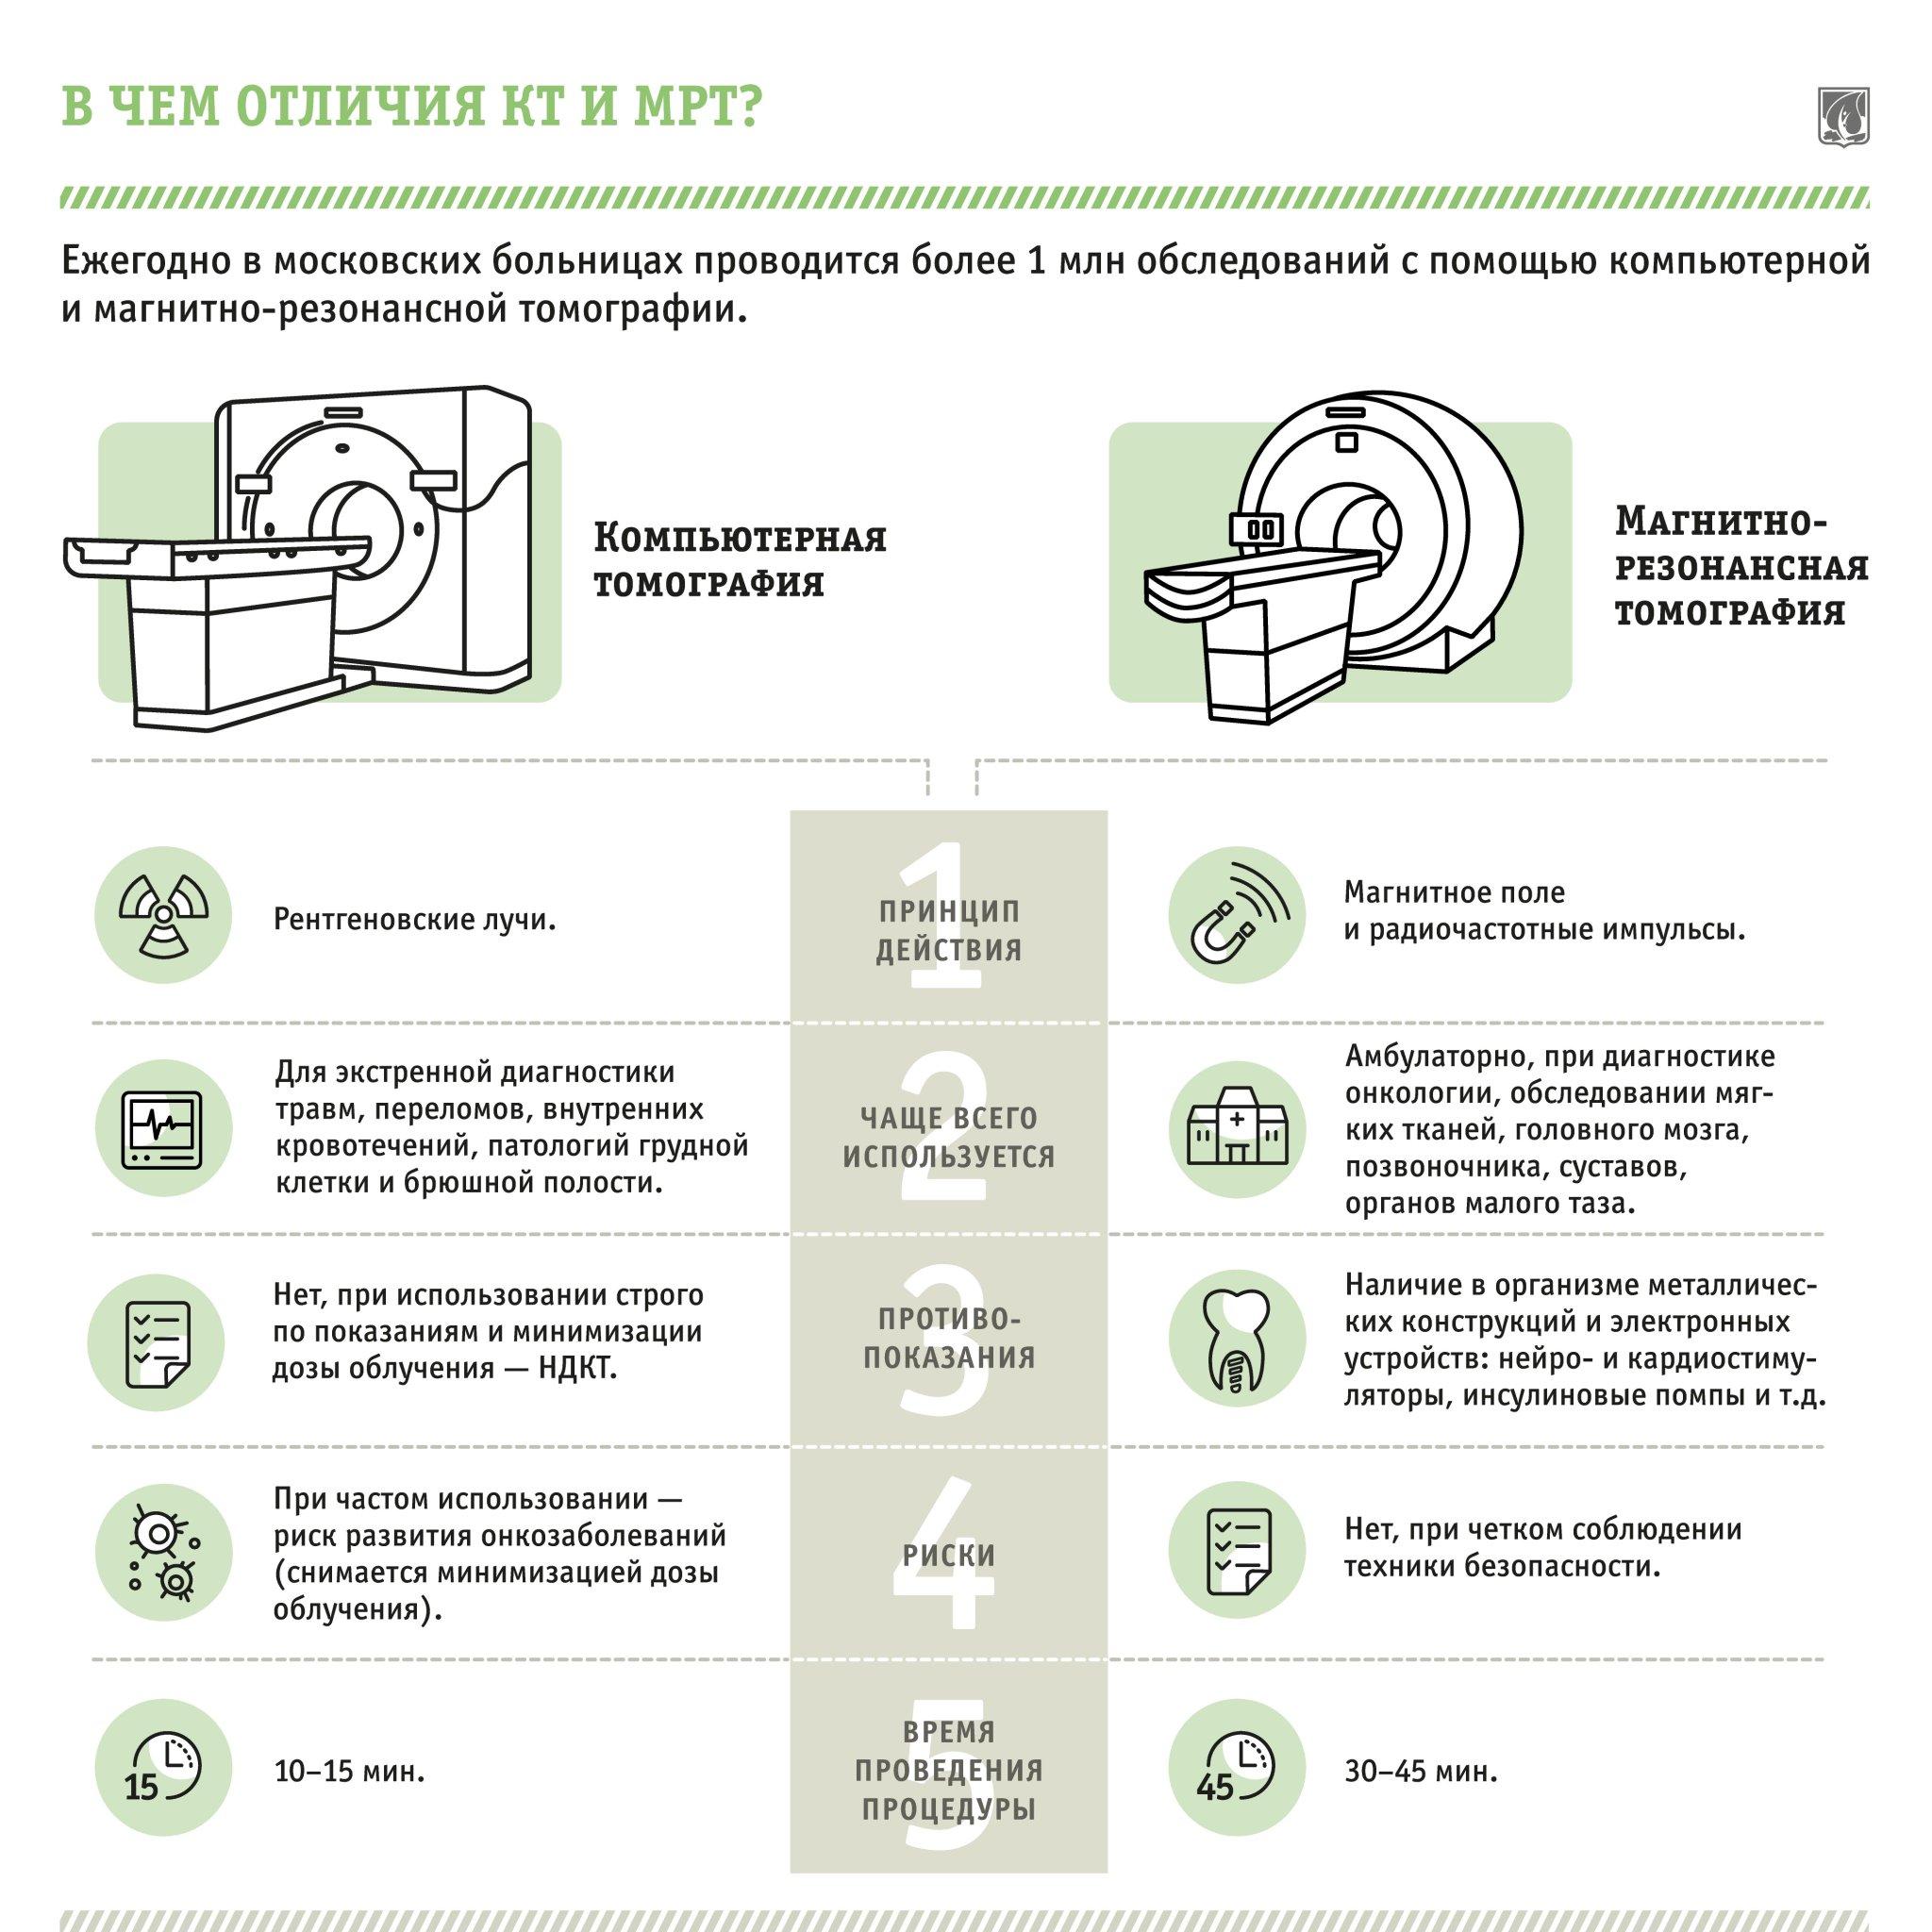 Отличия КТ от МРТ